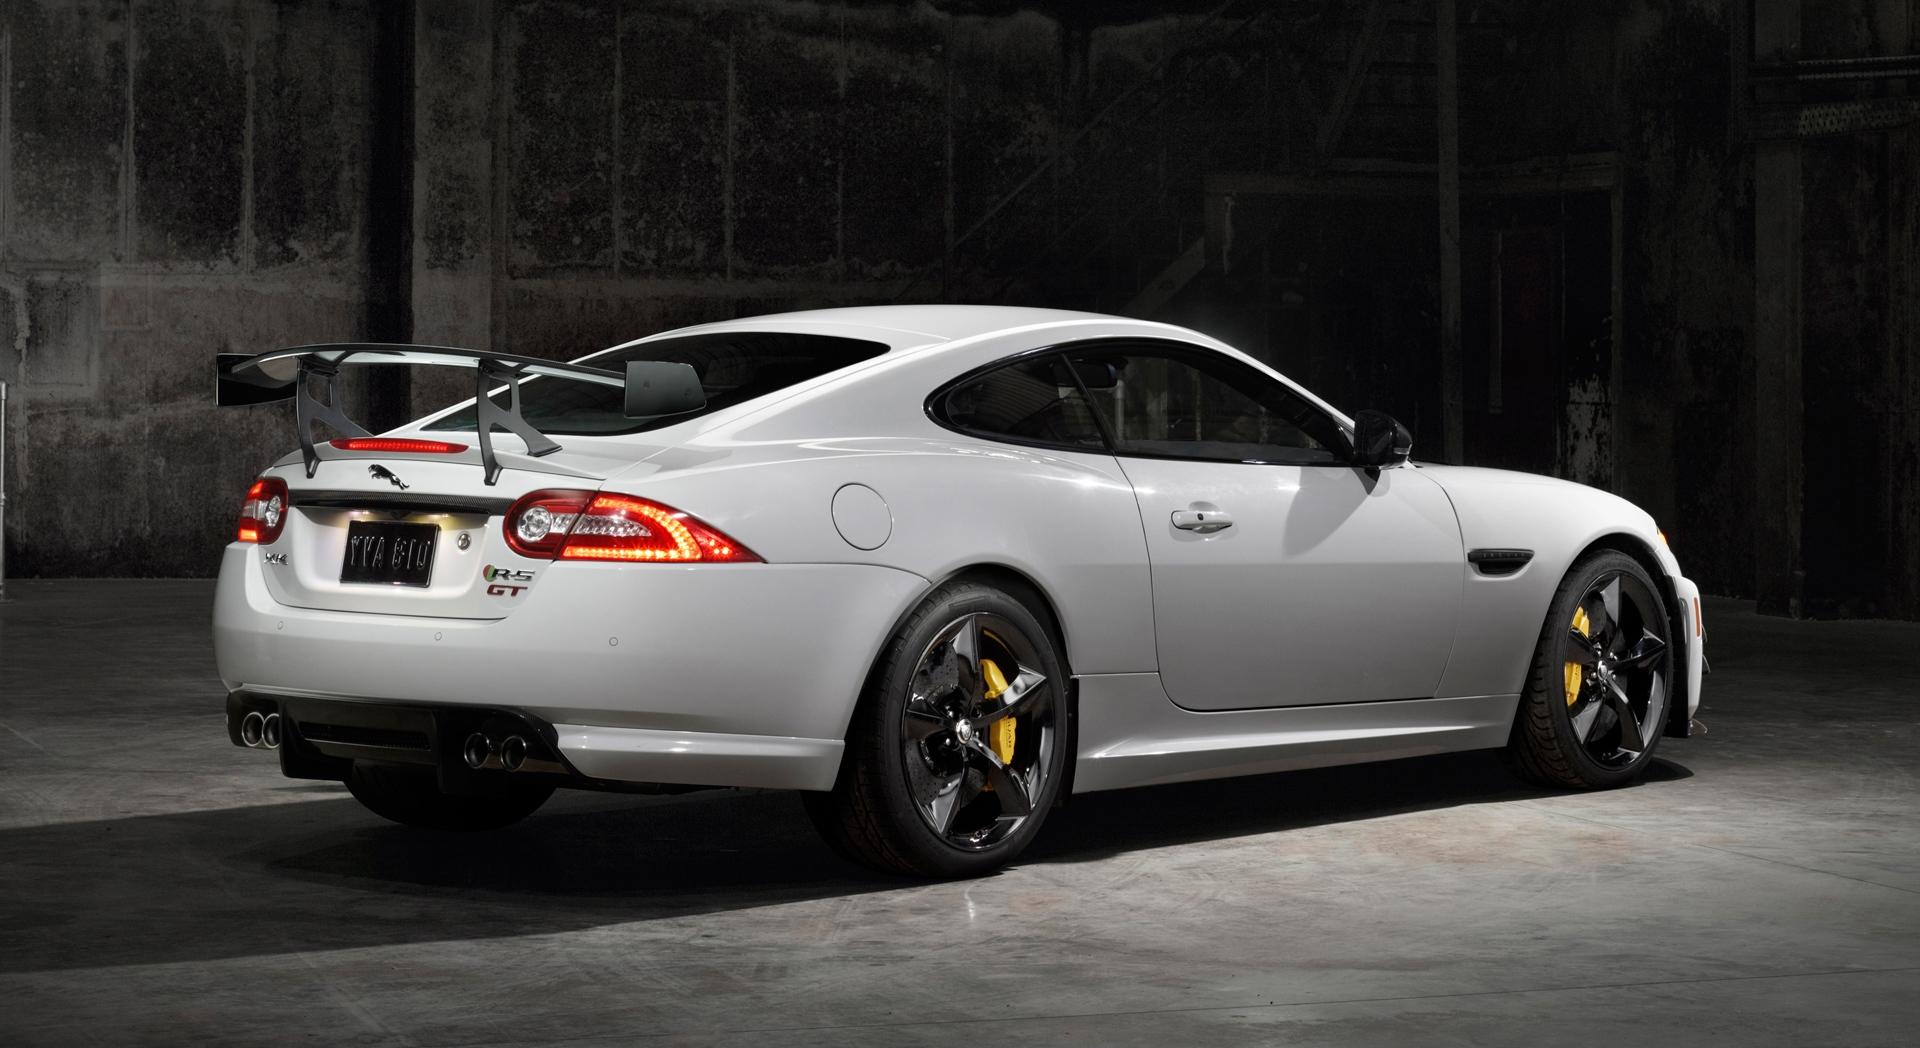 Jaguar Car Live Wallpaper Download Jaguar Xkr White Car Hd Desktop Wallpapers 4k Hd